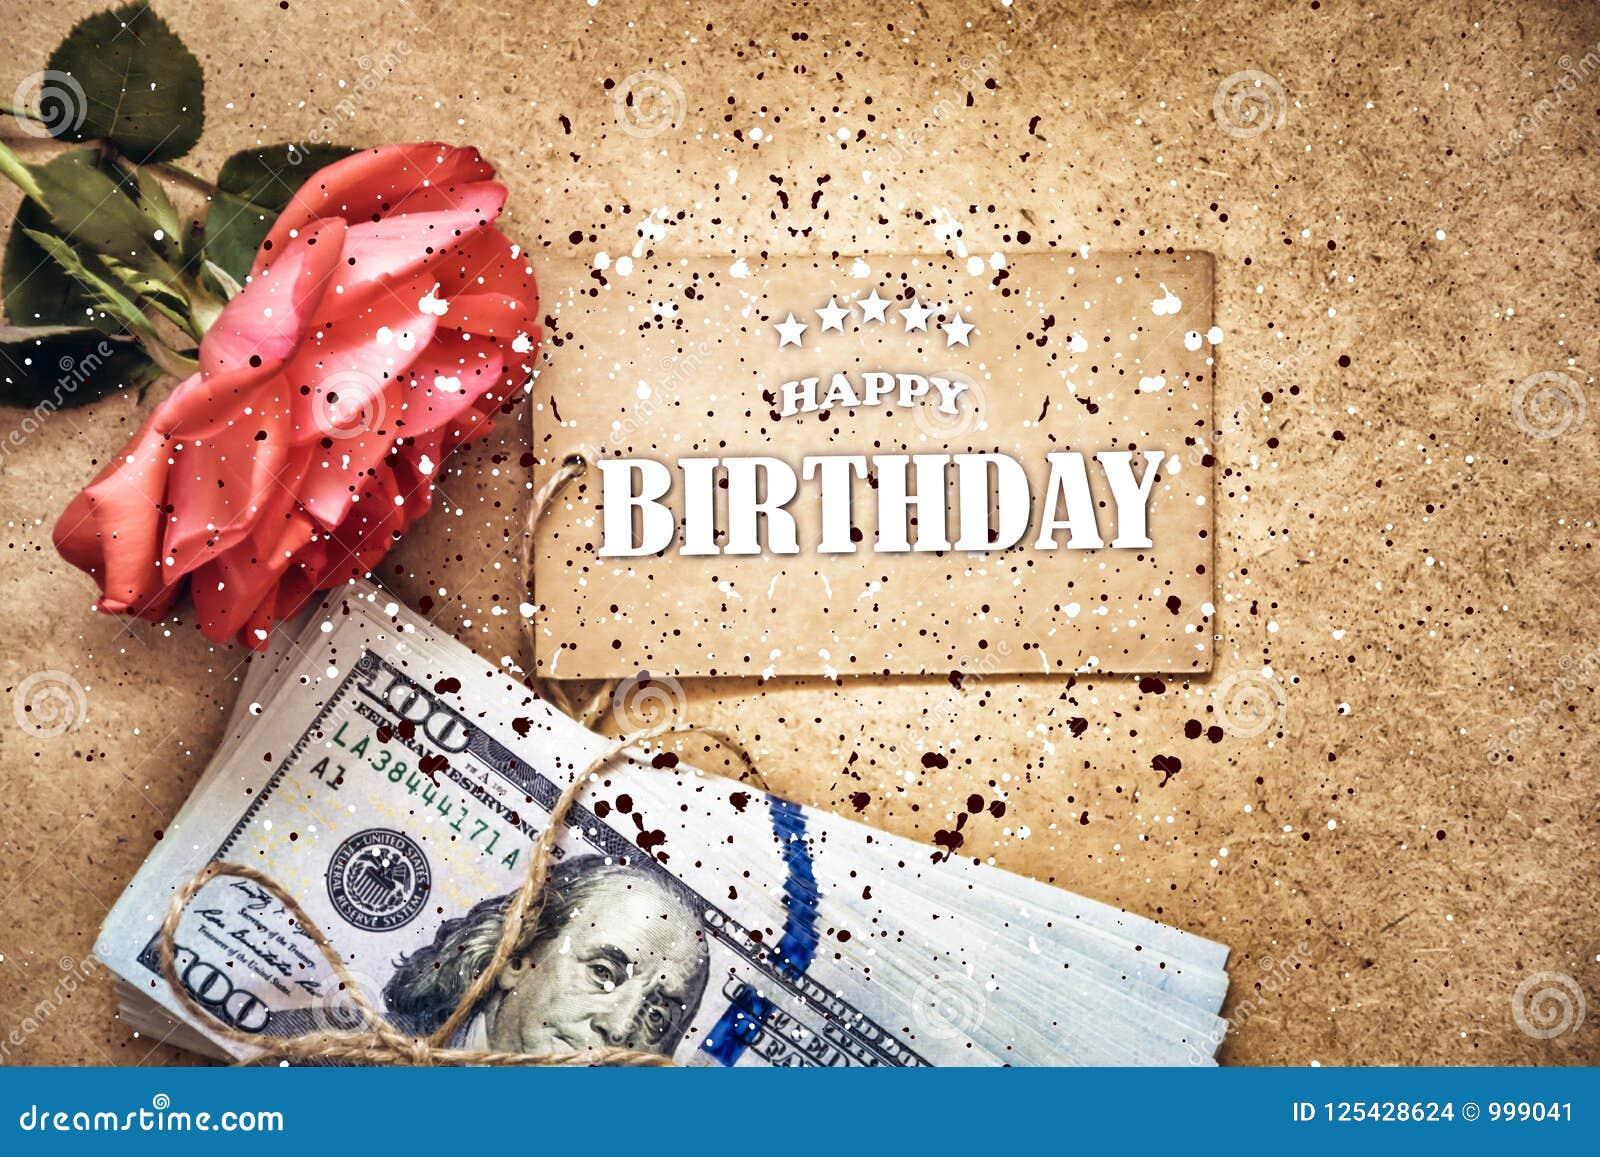 Happy birthday card  stock photo  Image of birthday - 125428624